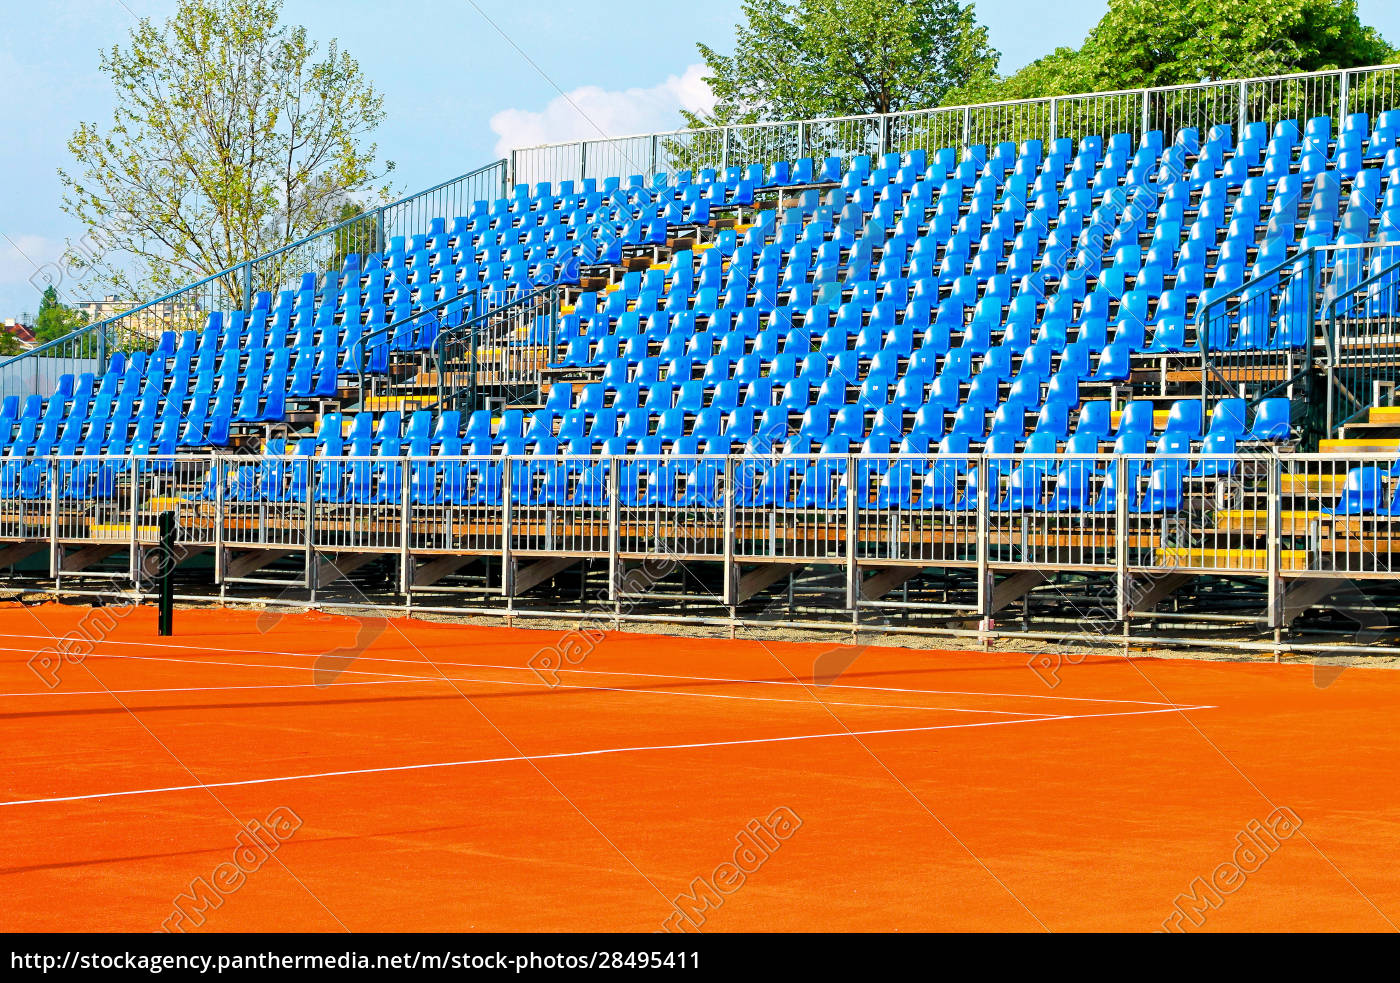 tennis, court, stands - 28495411